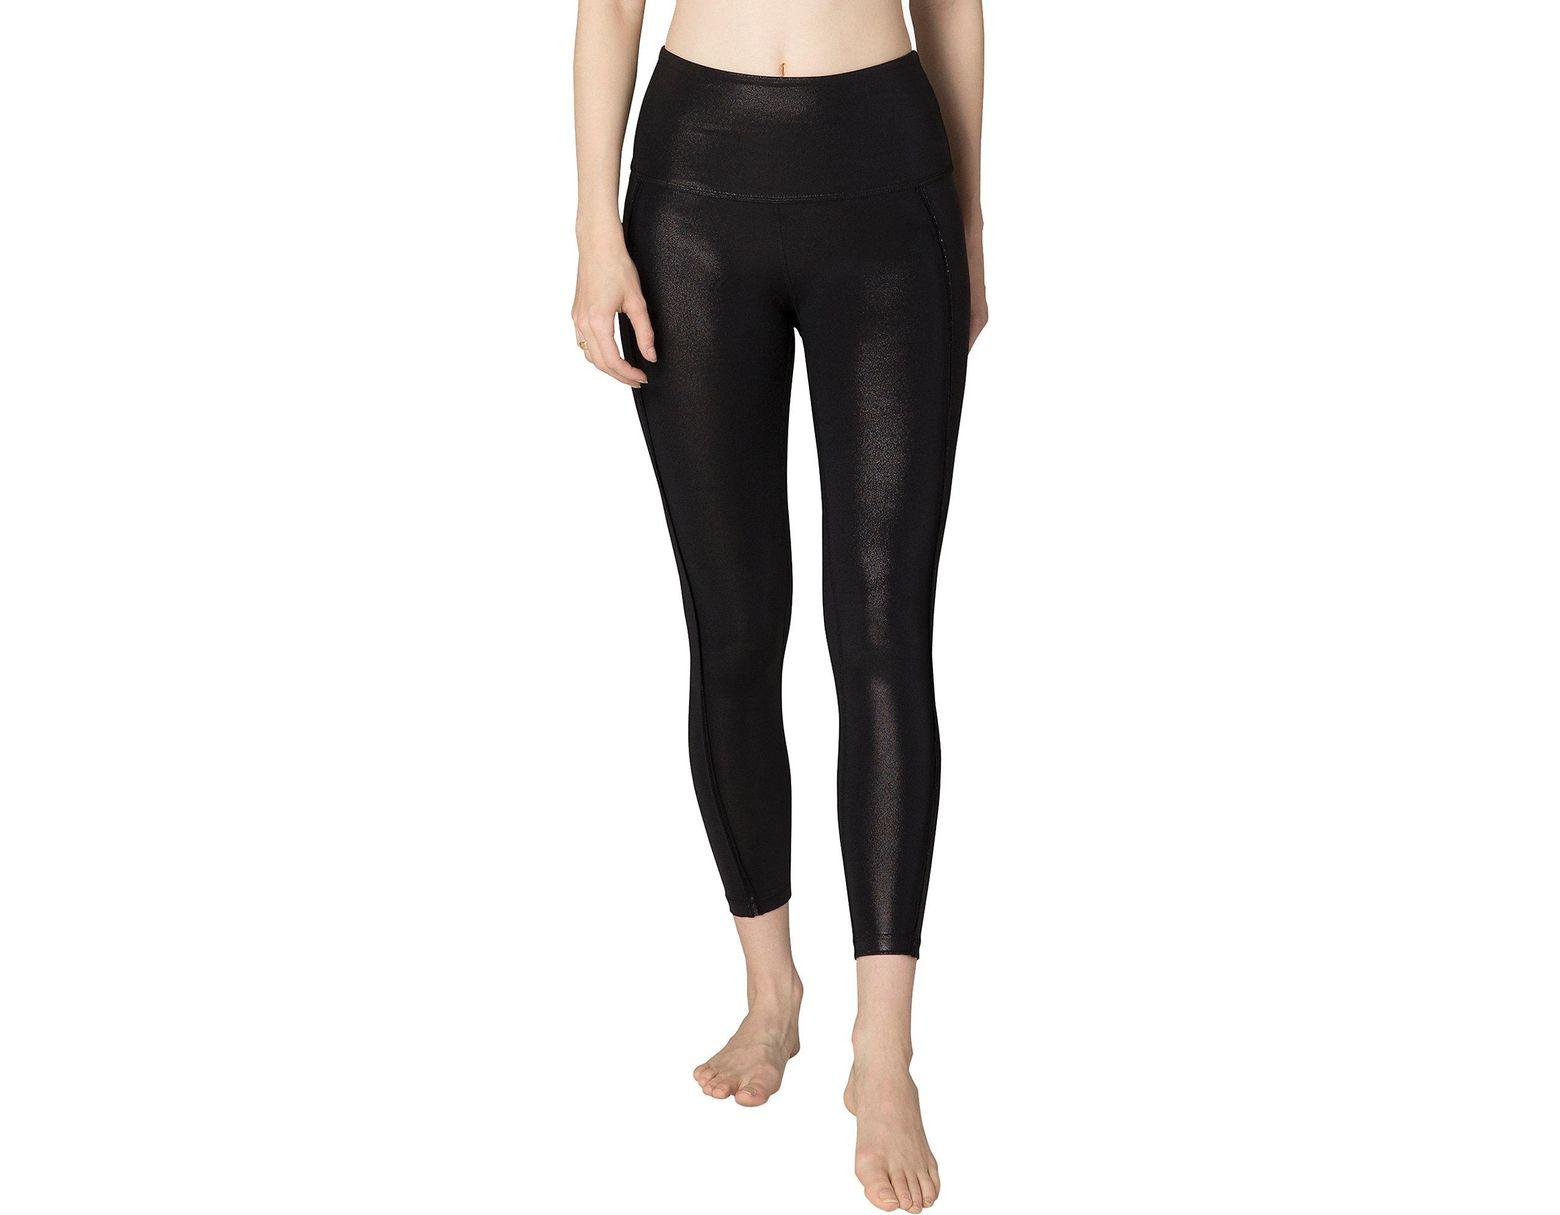 3fbcea0100 Beyond Yoga Pearlized Ride It High Waisted Midi Legging in Black - Lyst